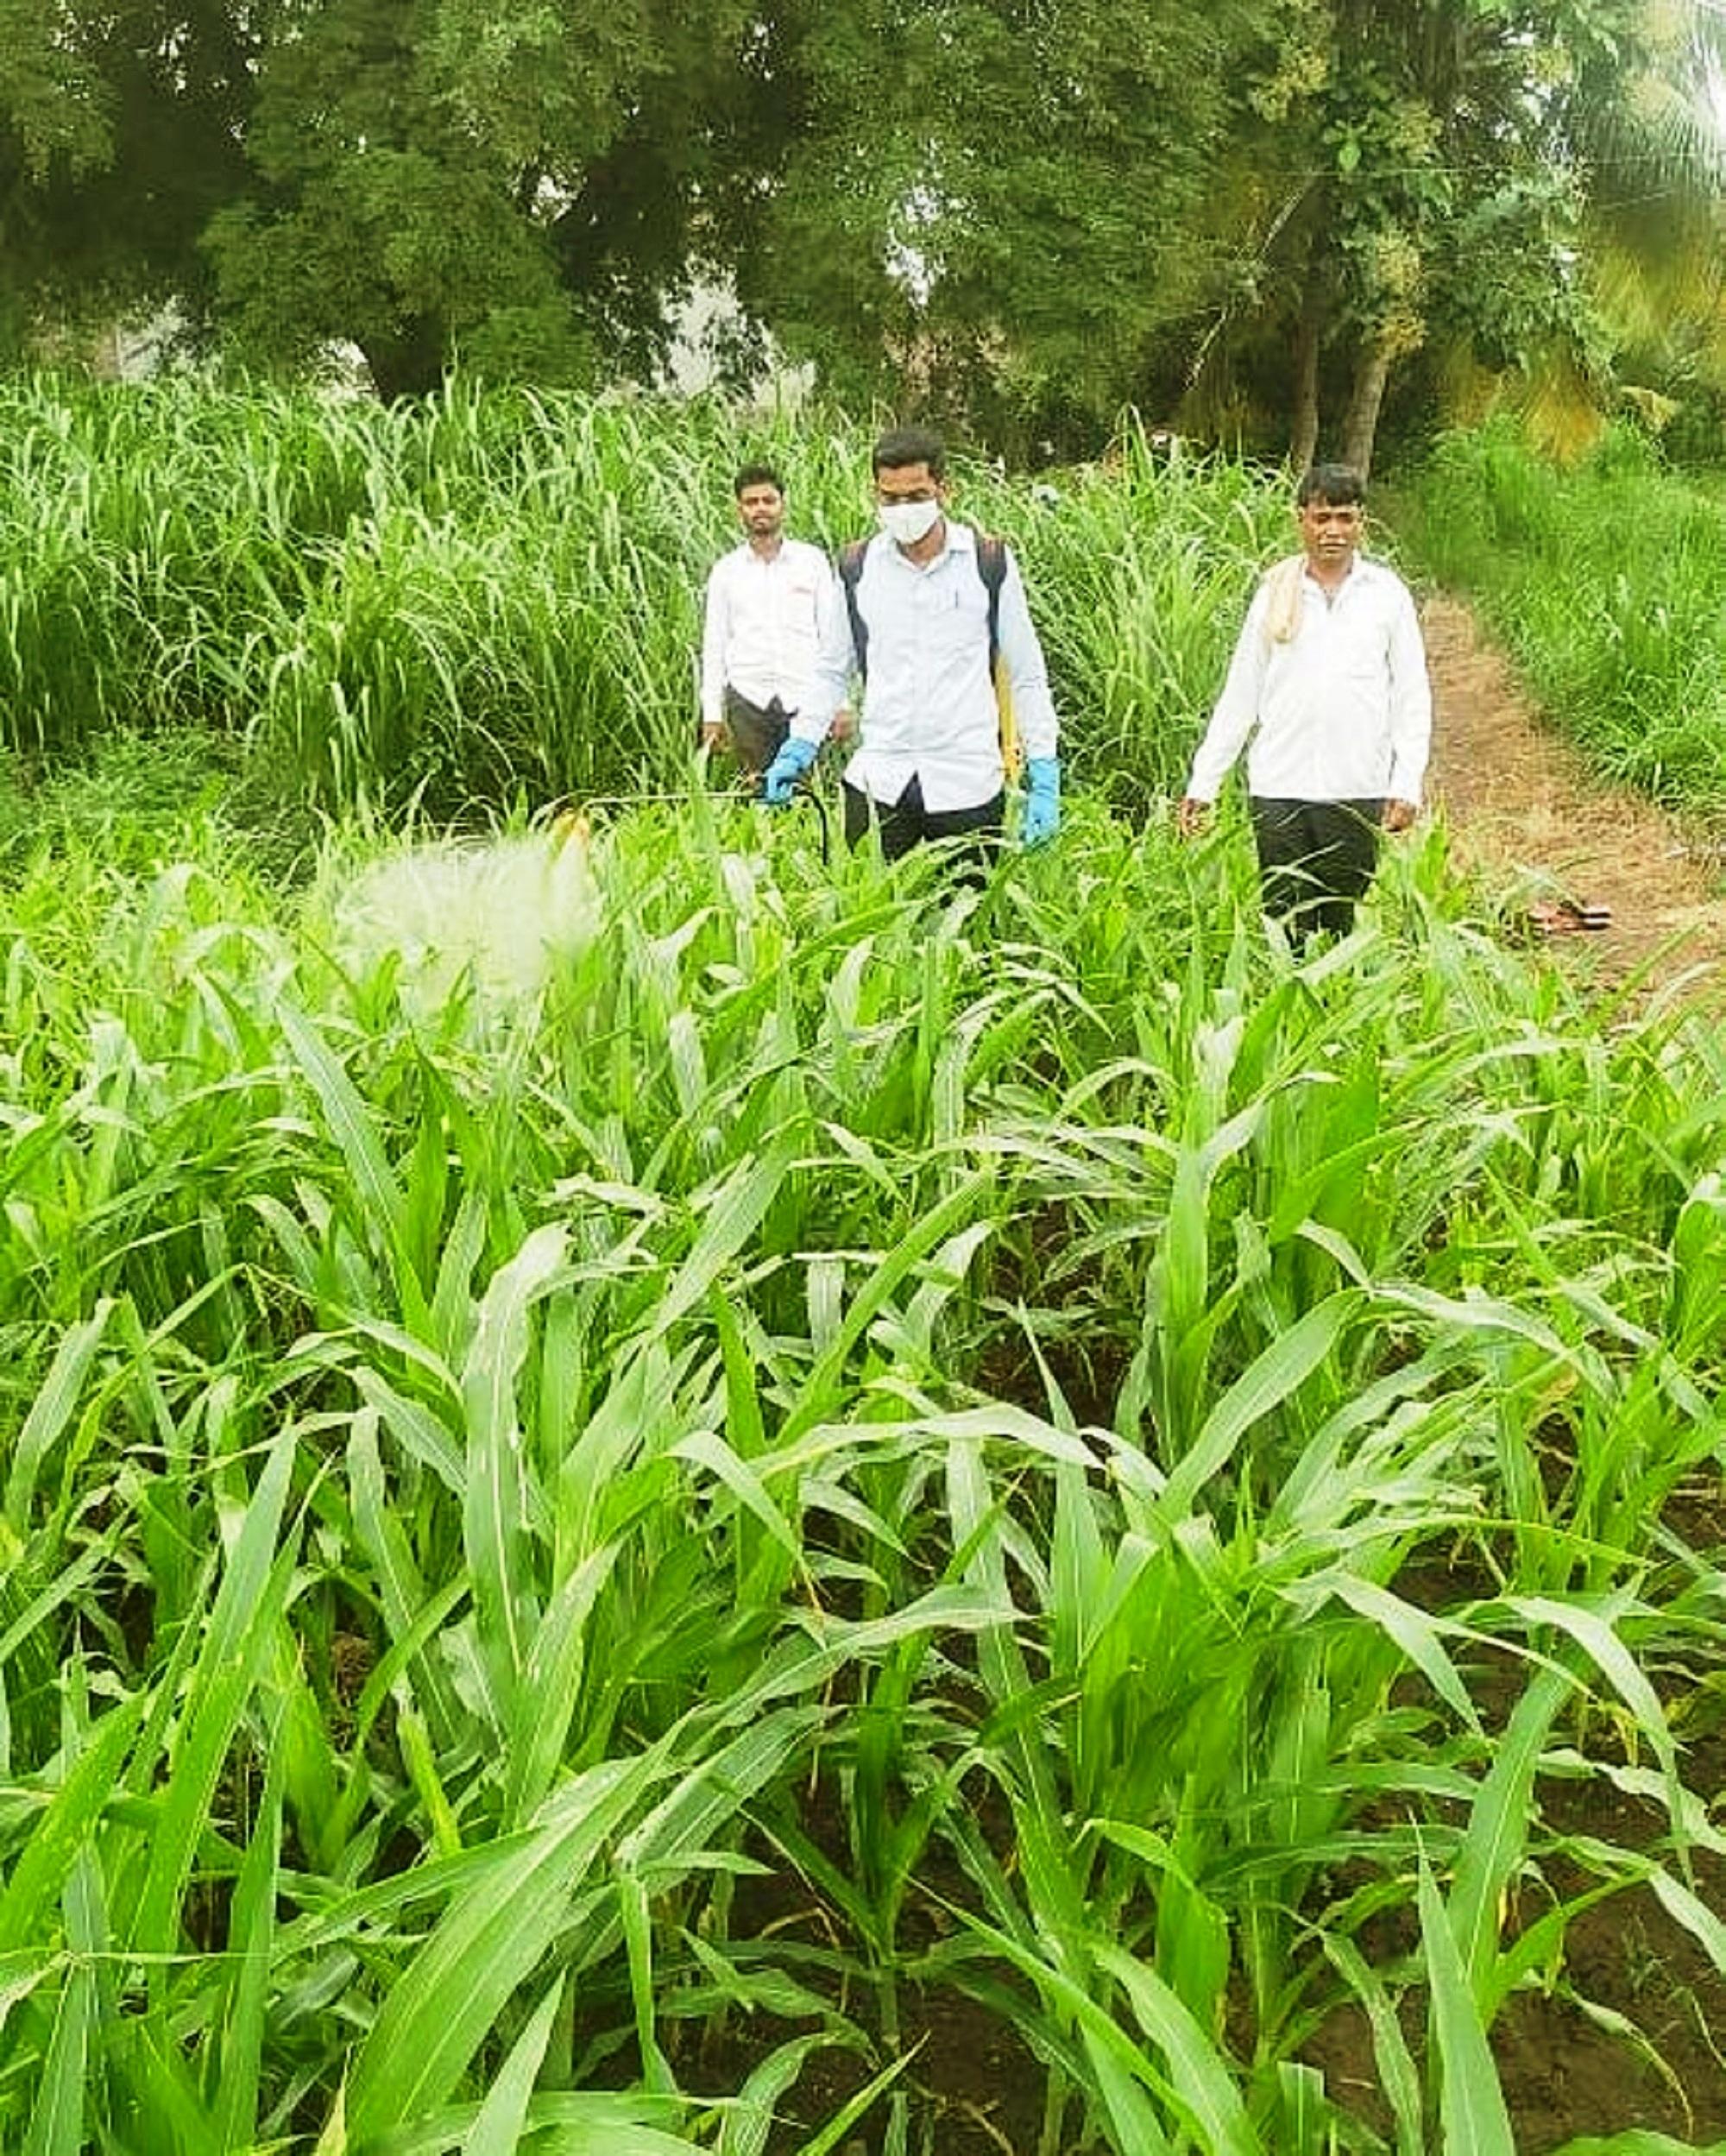 Men spraying pesticides in plants